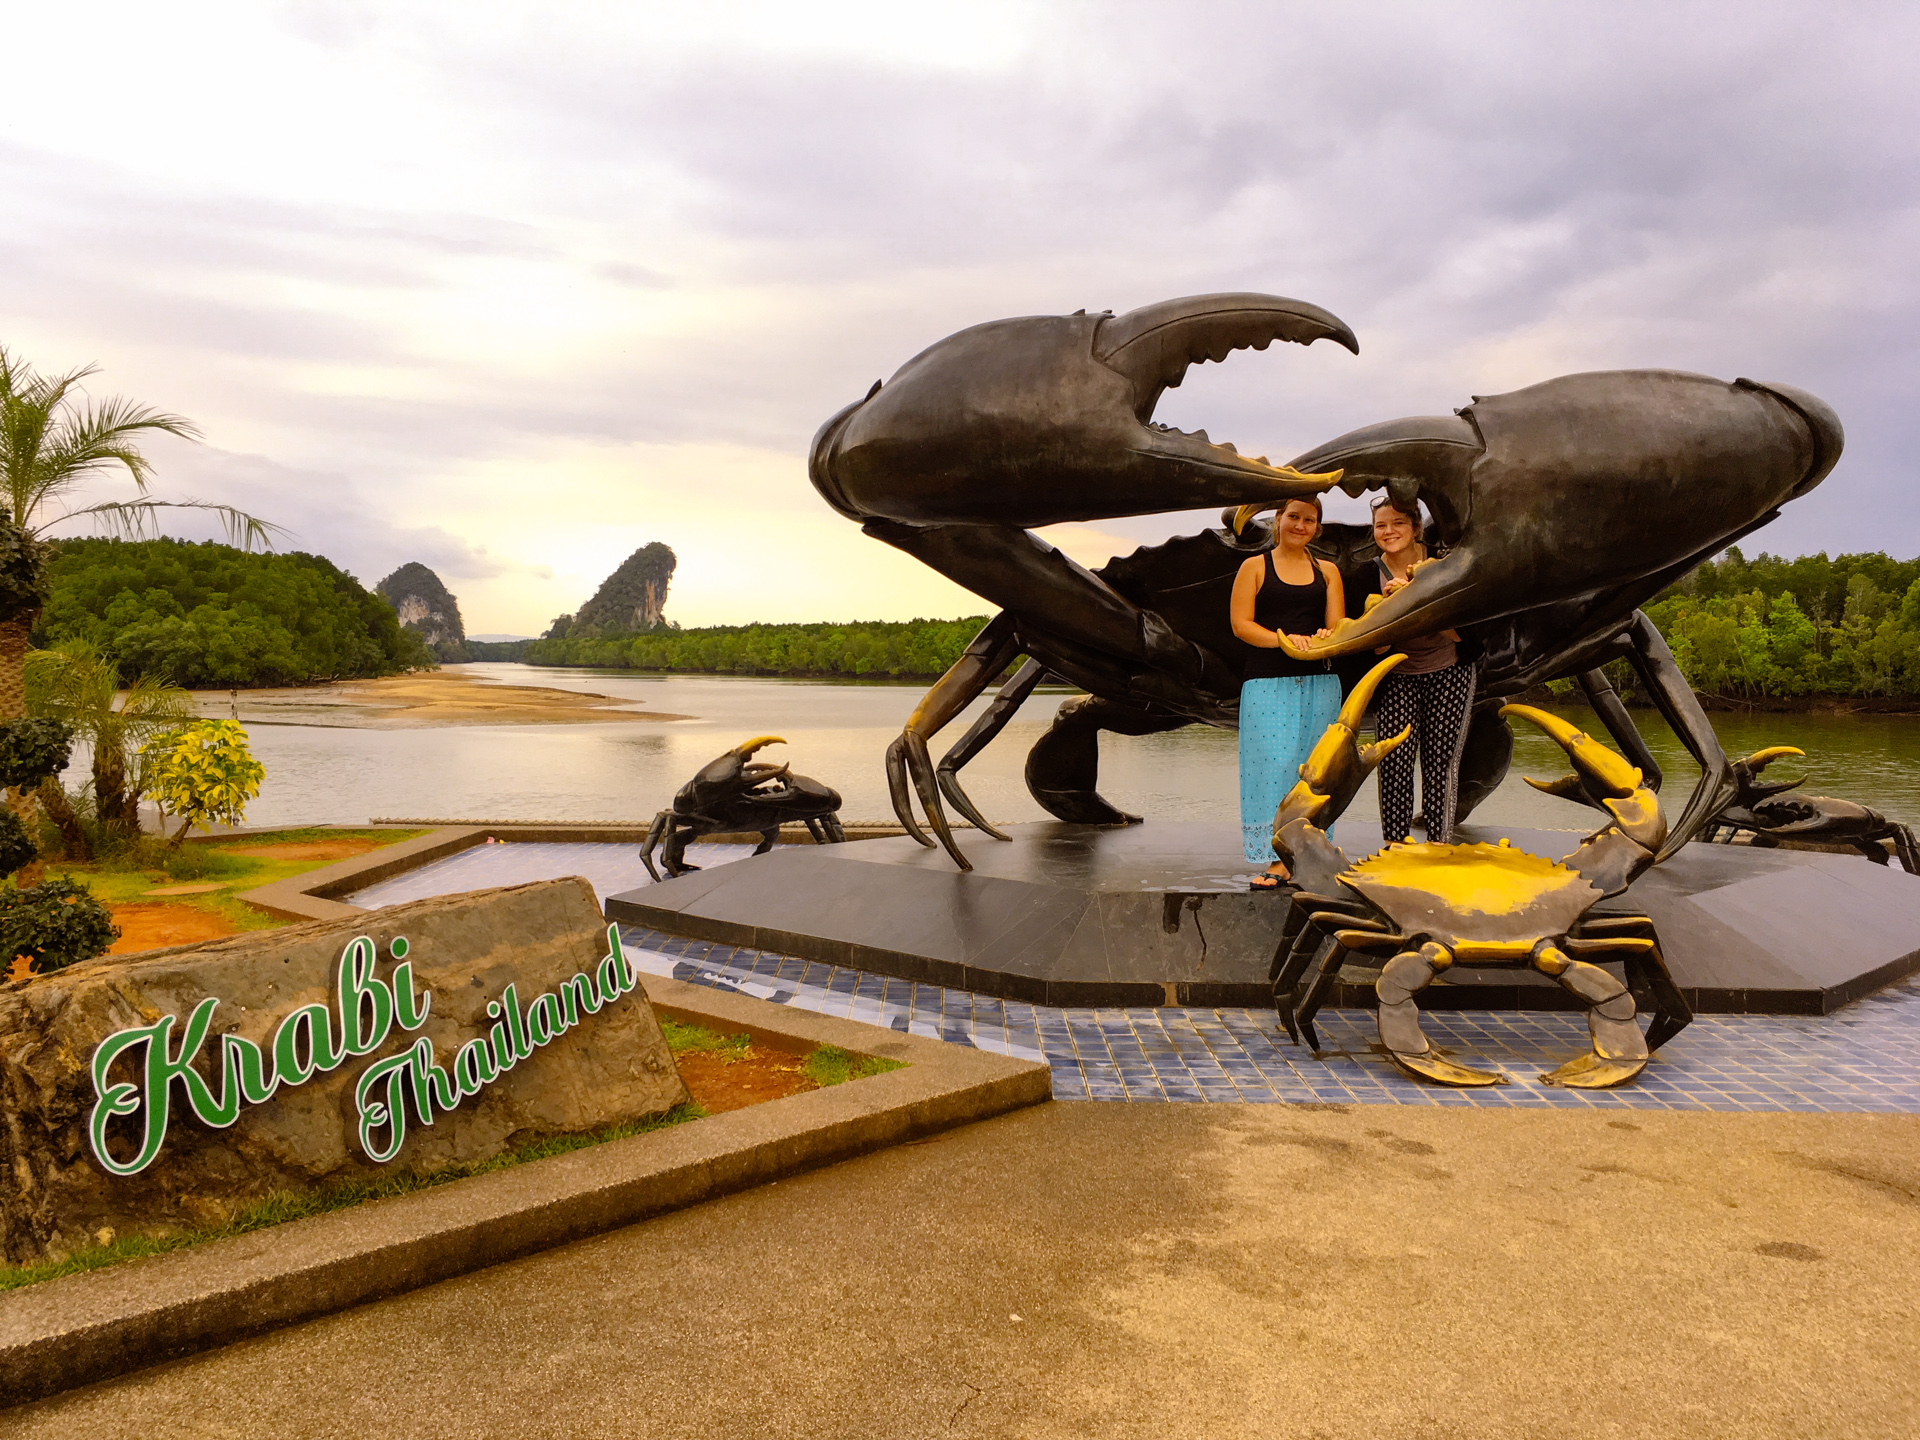 Krabi Crab Bronze Statue